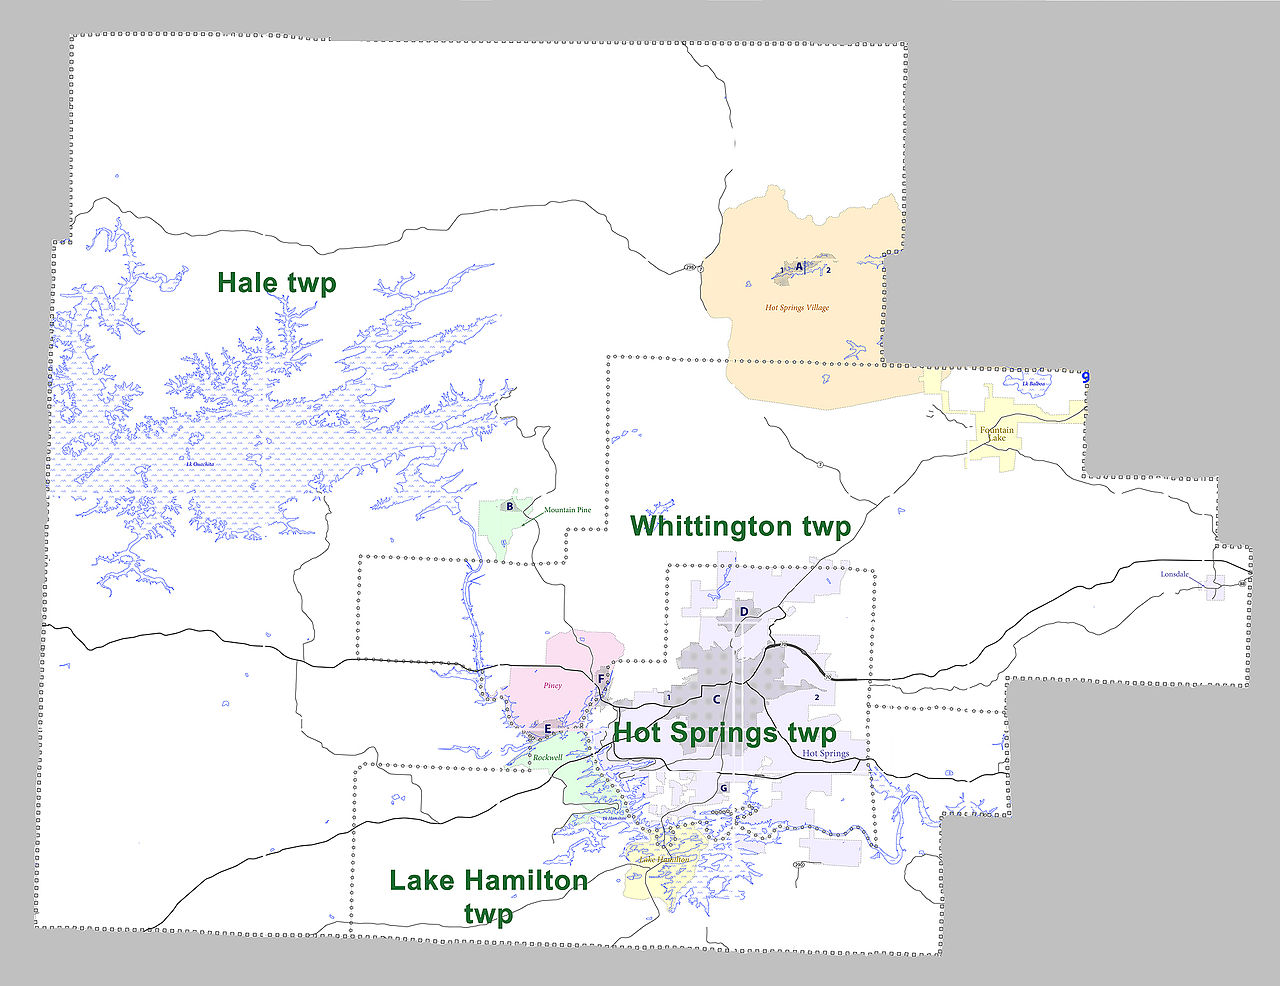 FileGarland County Arkansas 2010 Township Map largejpg Wikimedia